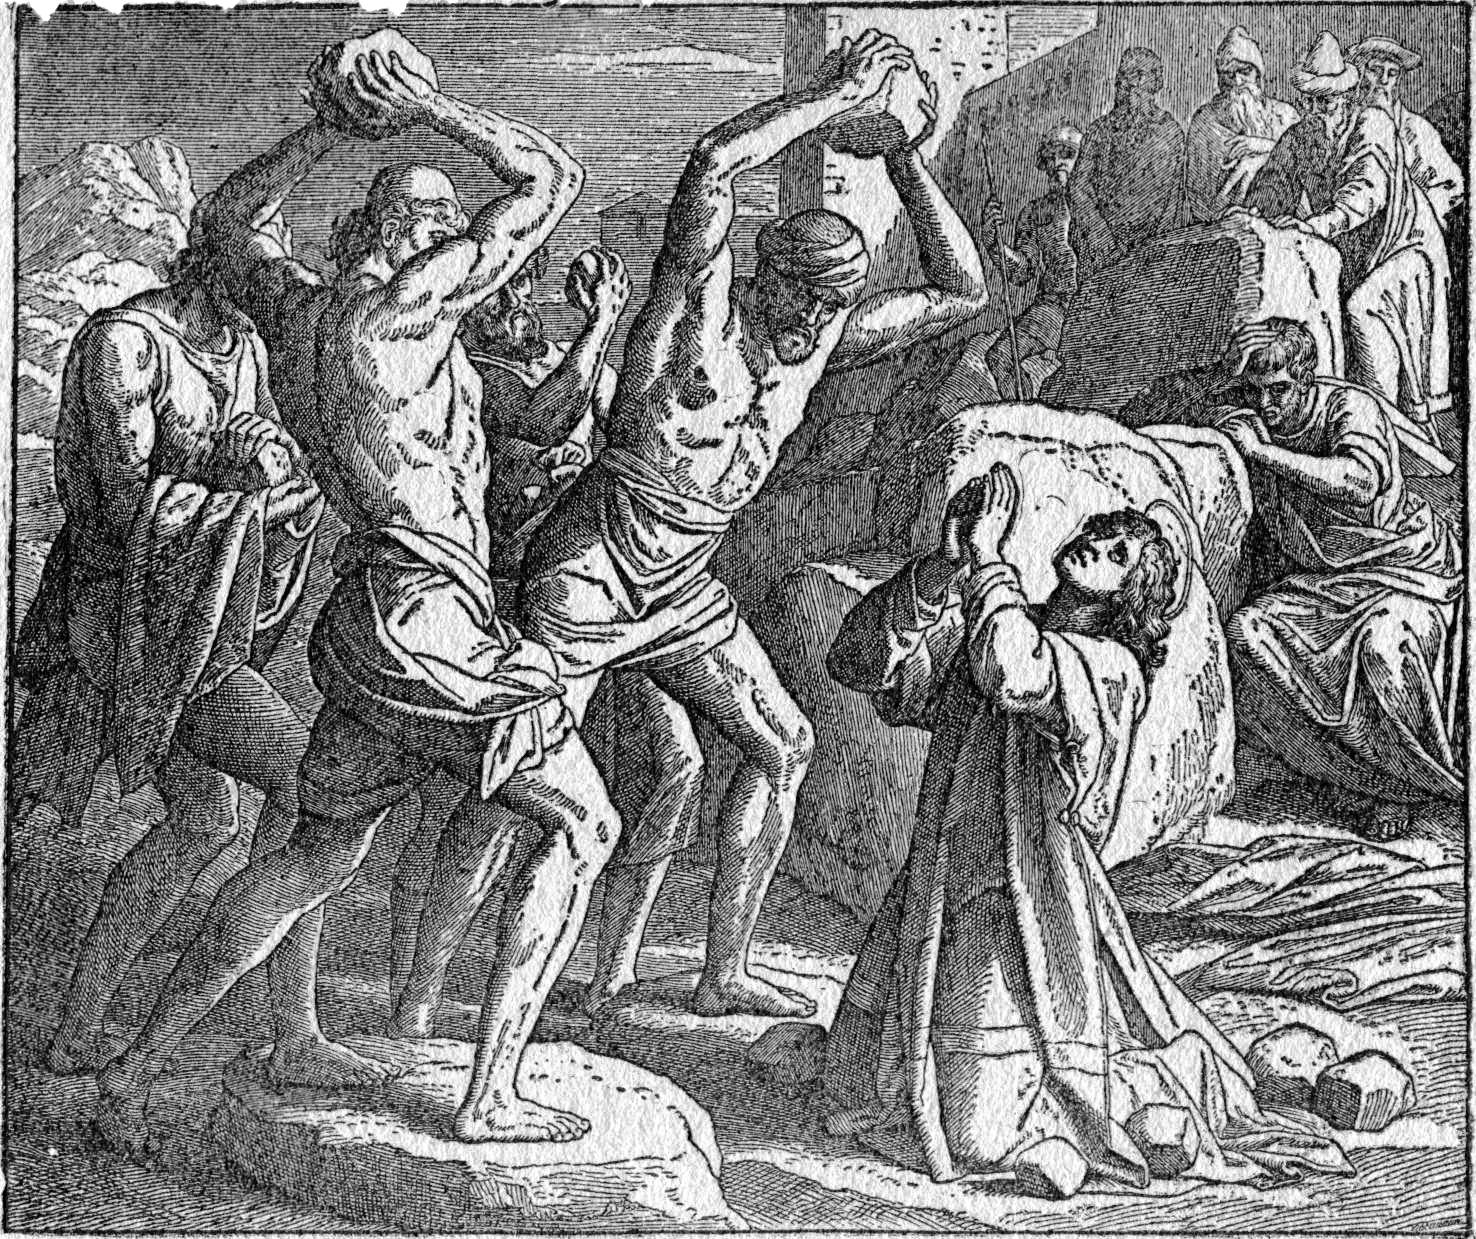 Come Lord Jesus: Forgotten Christian Values: Suffering